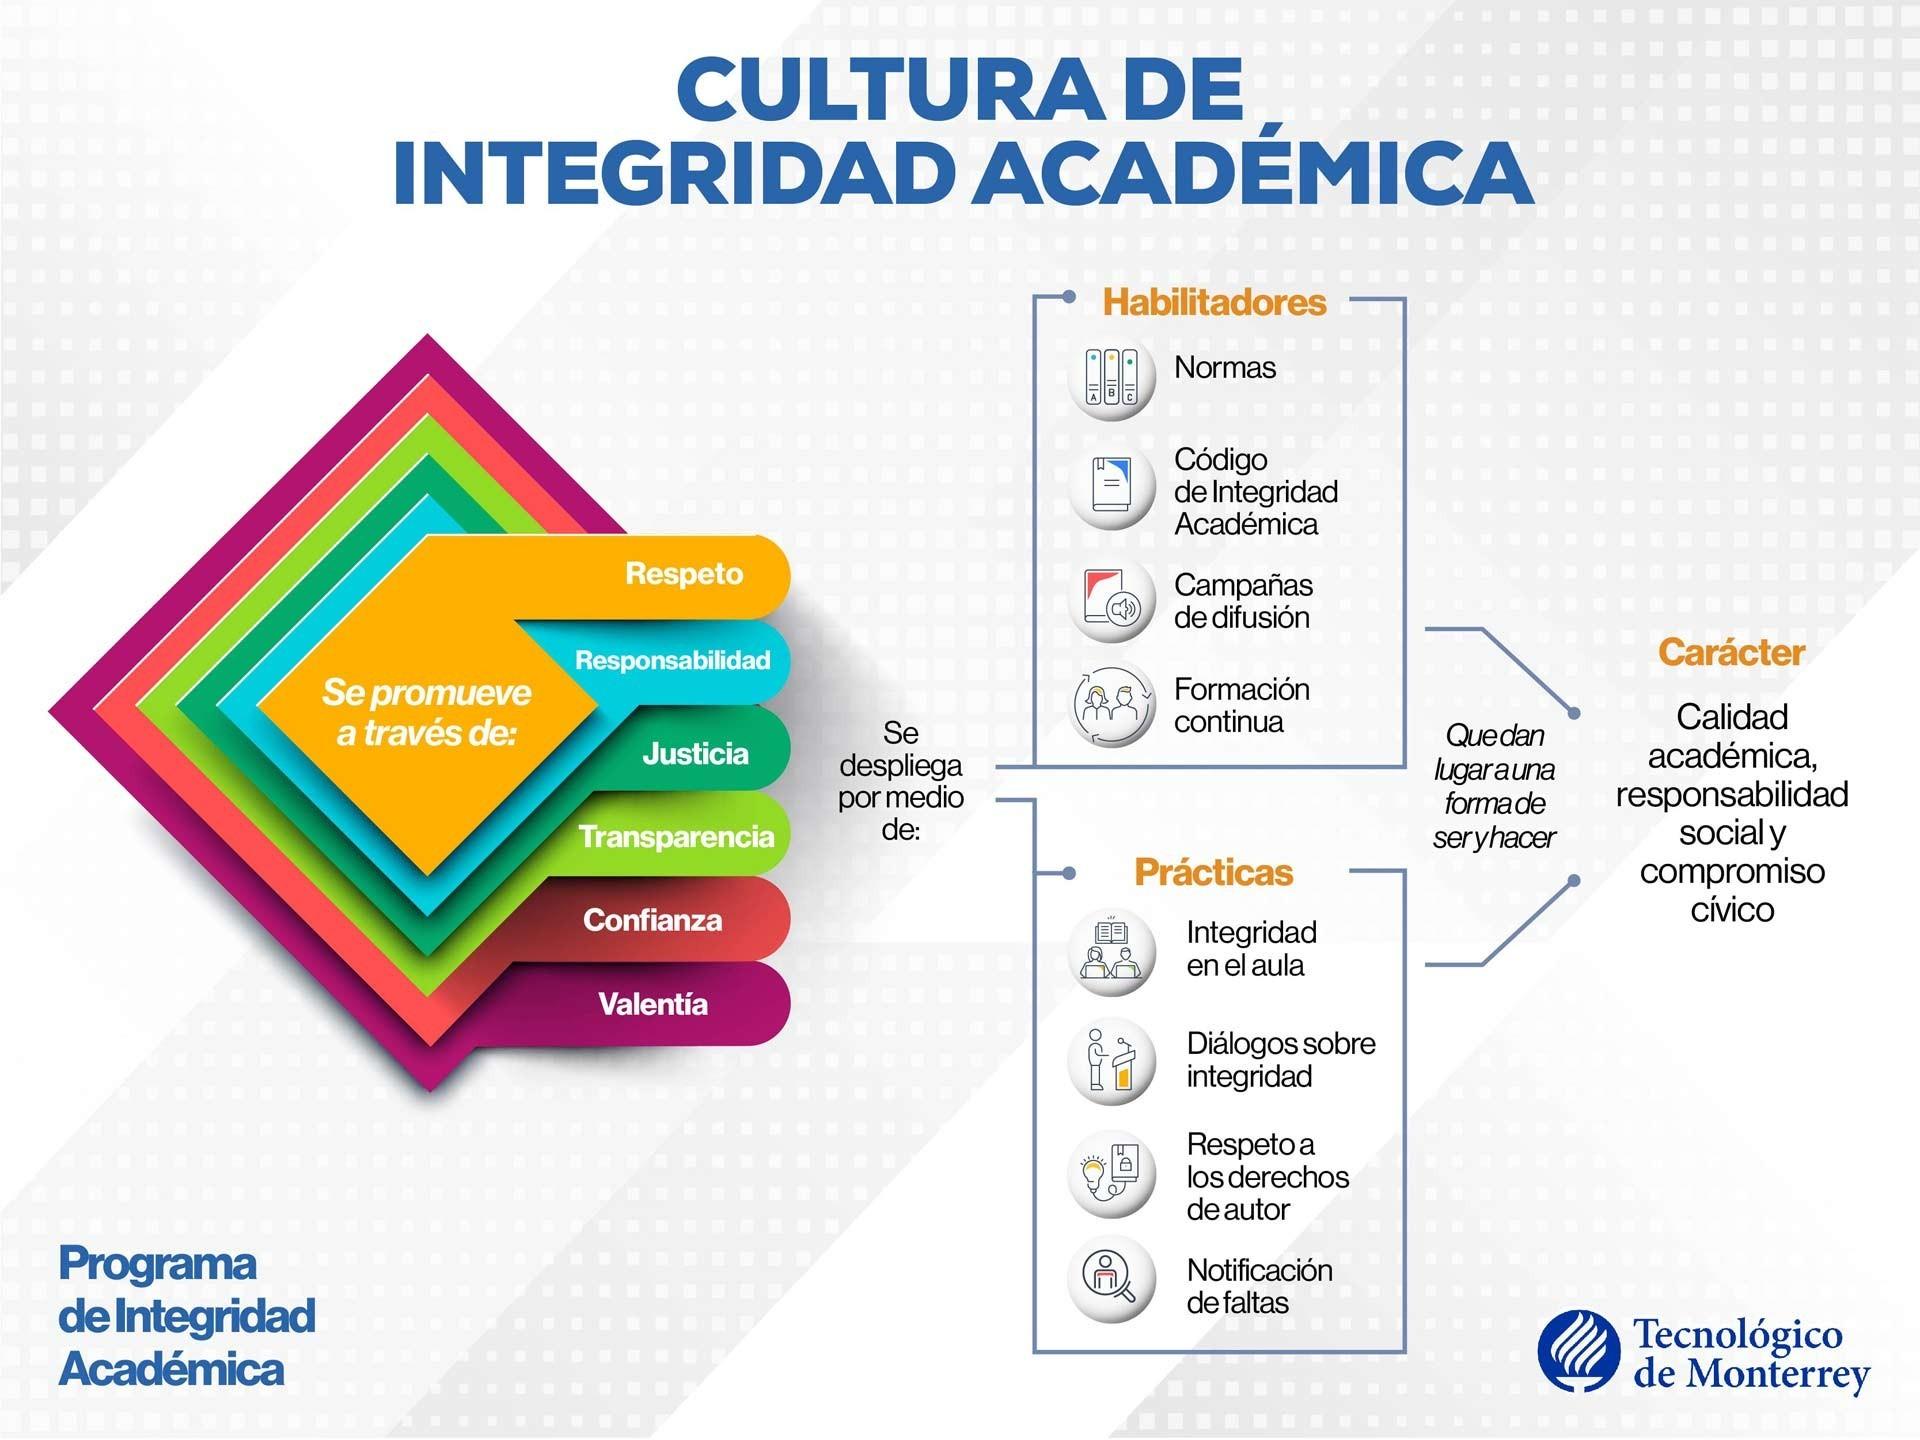 El Tec de Monterrey promueve la cultura de integridad a través de su Modelo de Integridad Académica